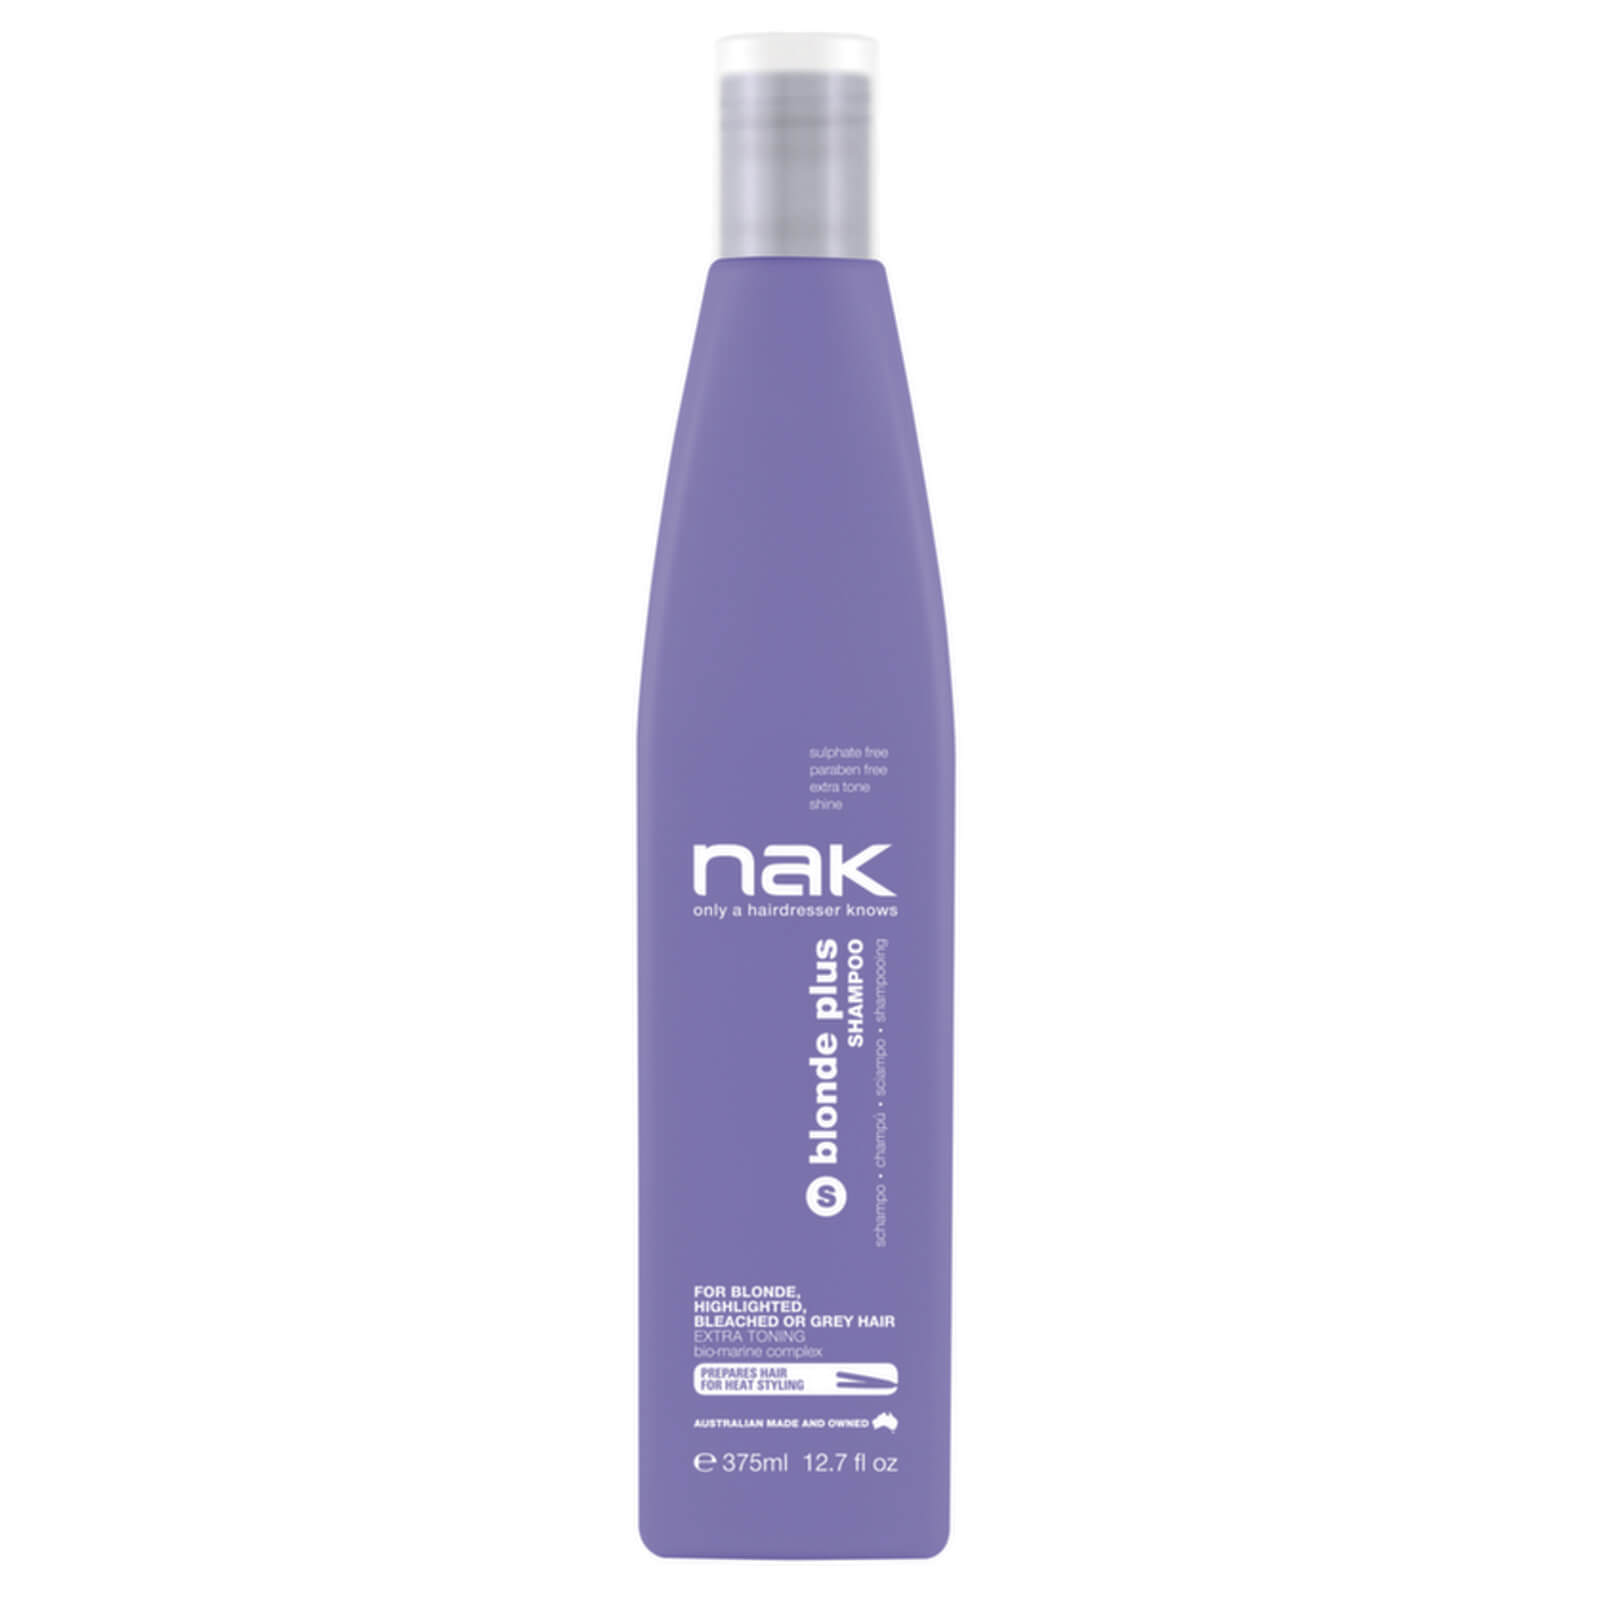 Nak Blonde Plusshampoo 375ml Buy Online At Ry Garnier Pure Active Acne Care Whitening Cream 20ml Description